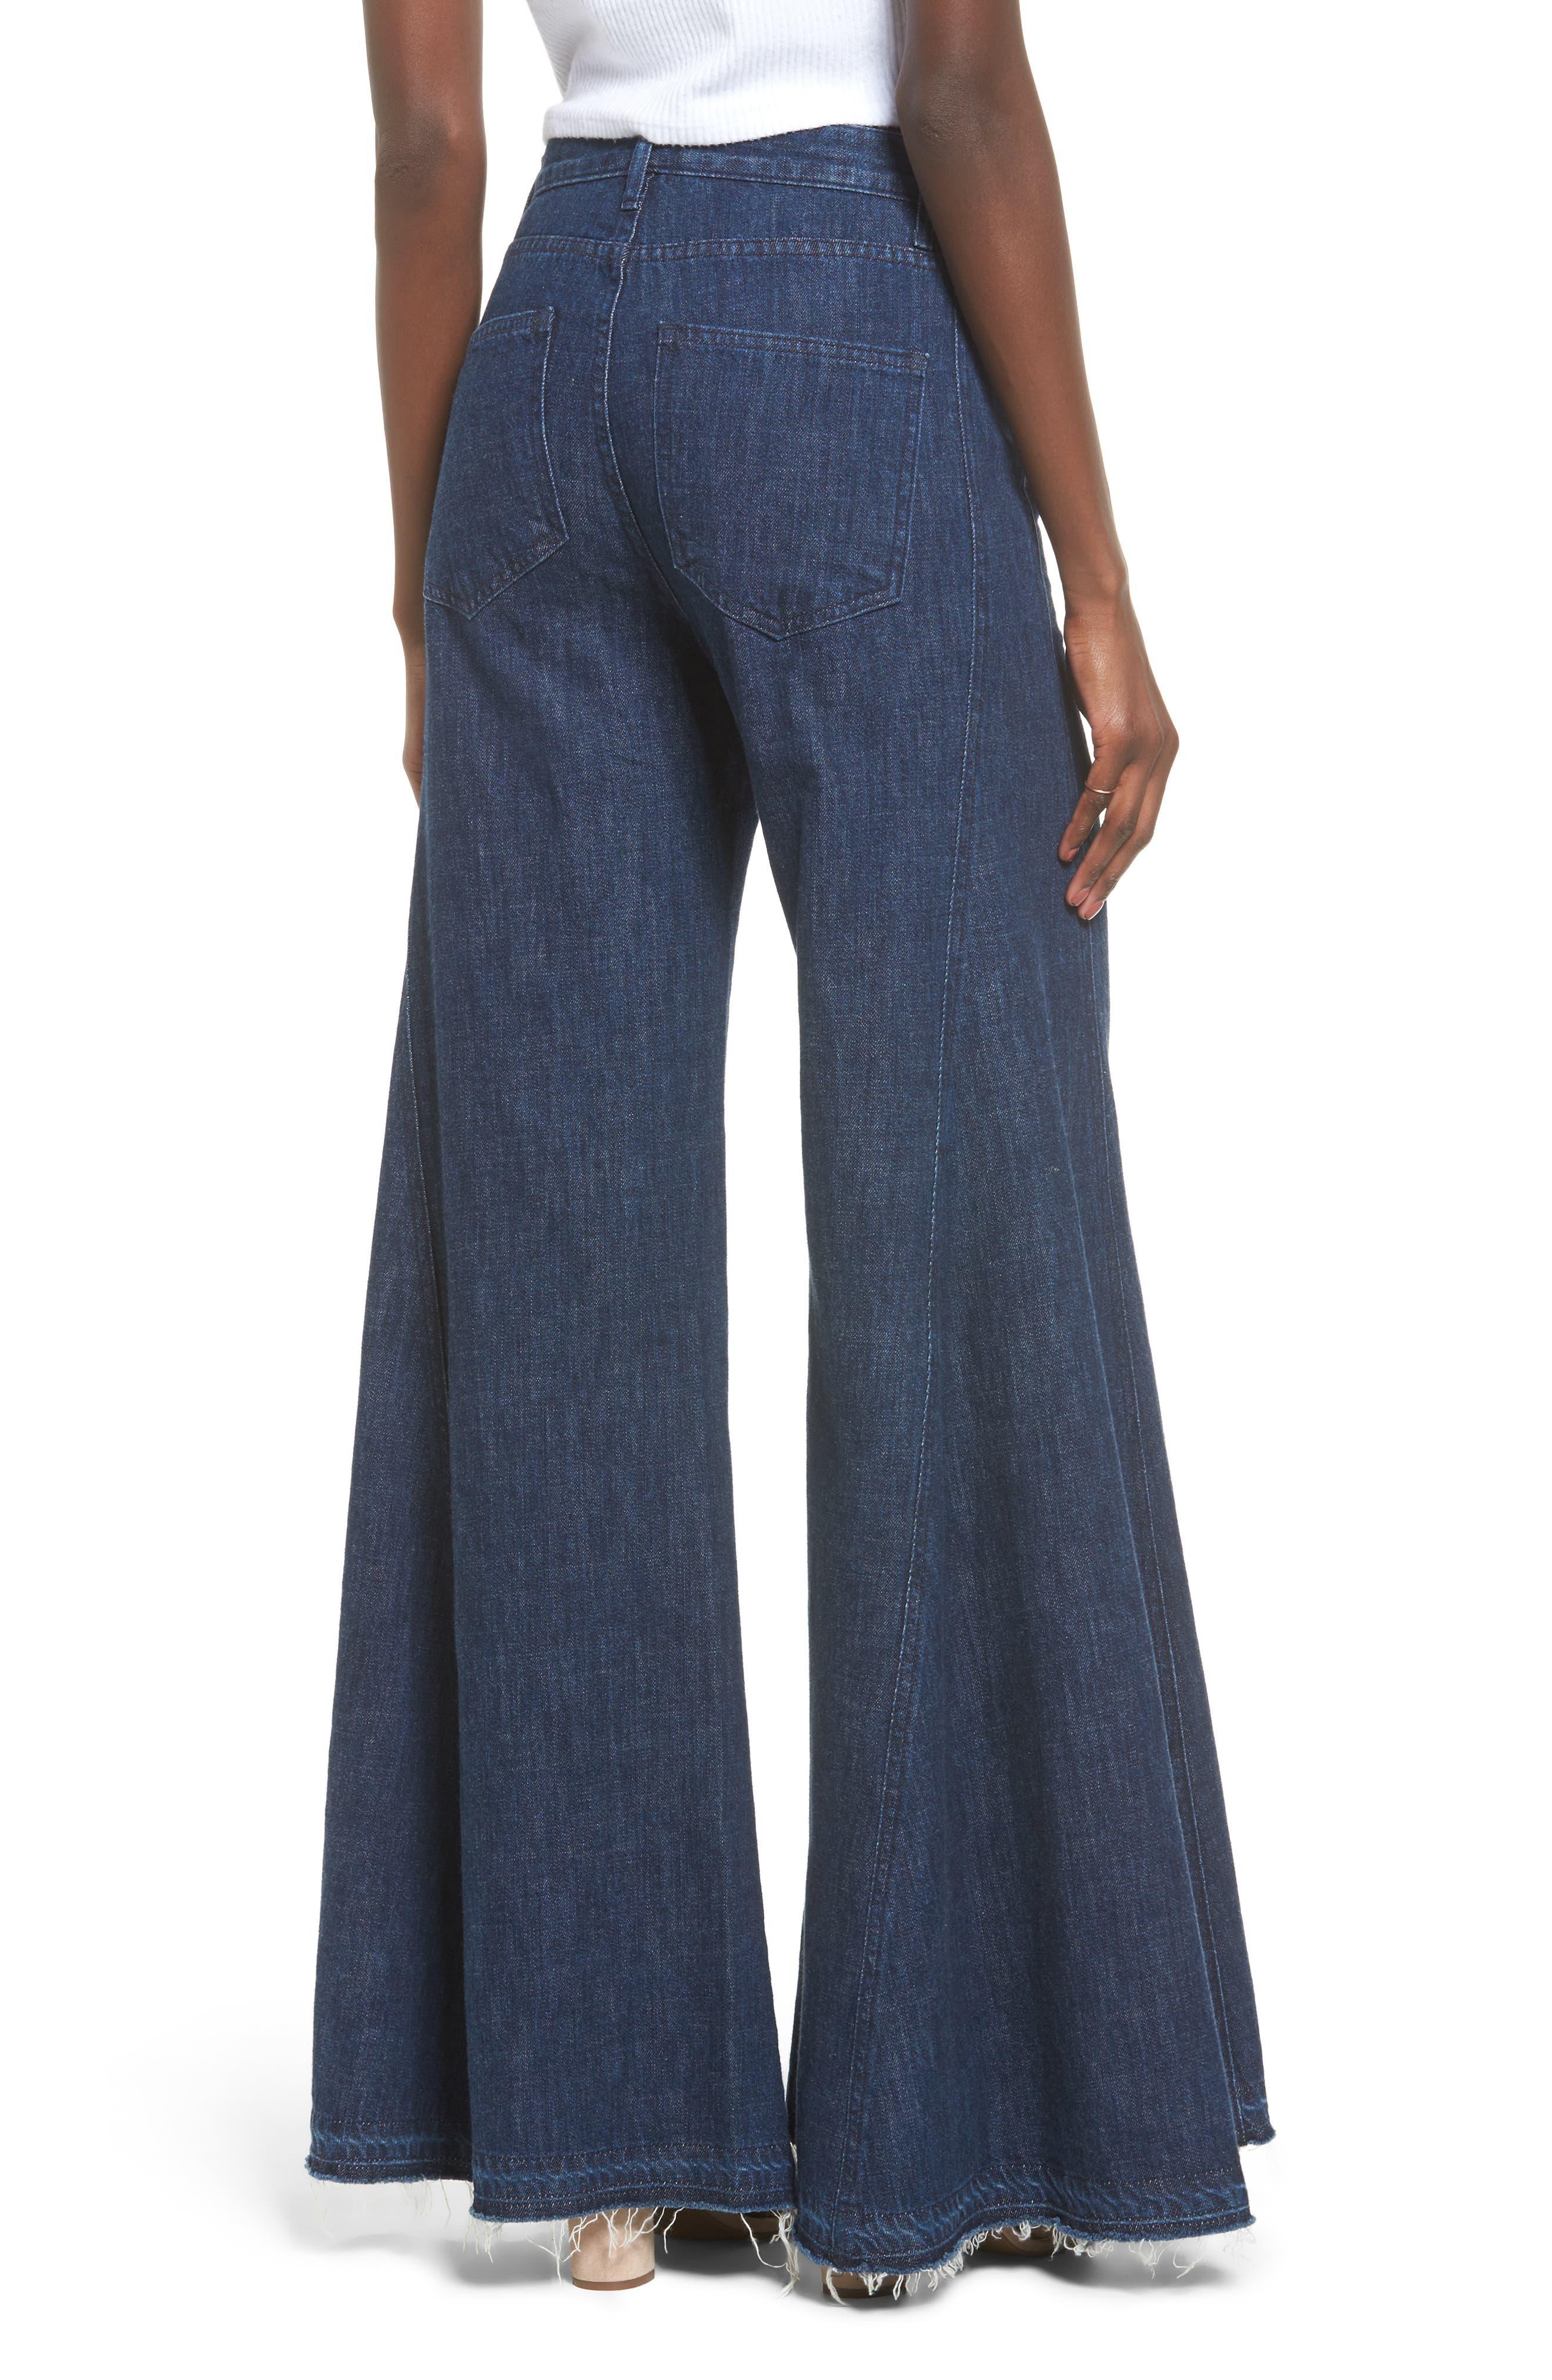 San Fran Super Flare Denim Pants,                             Alternate thumbnail 2, color,                             400